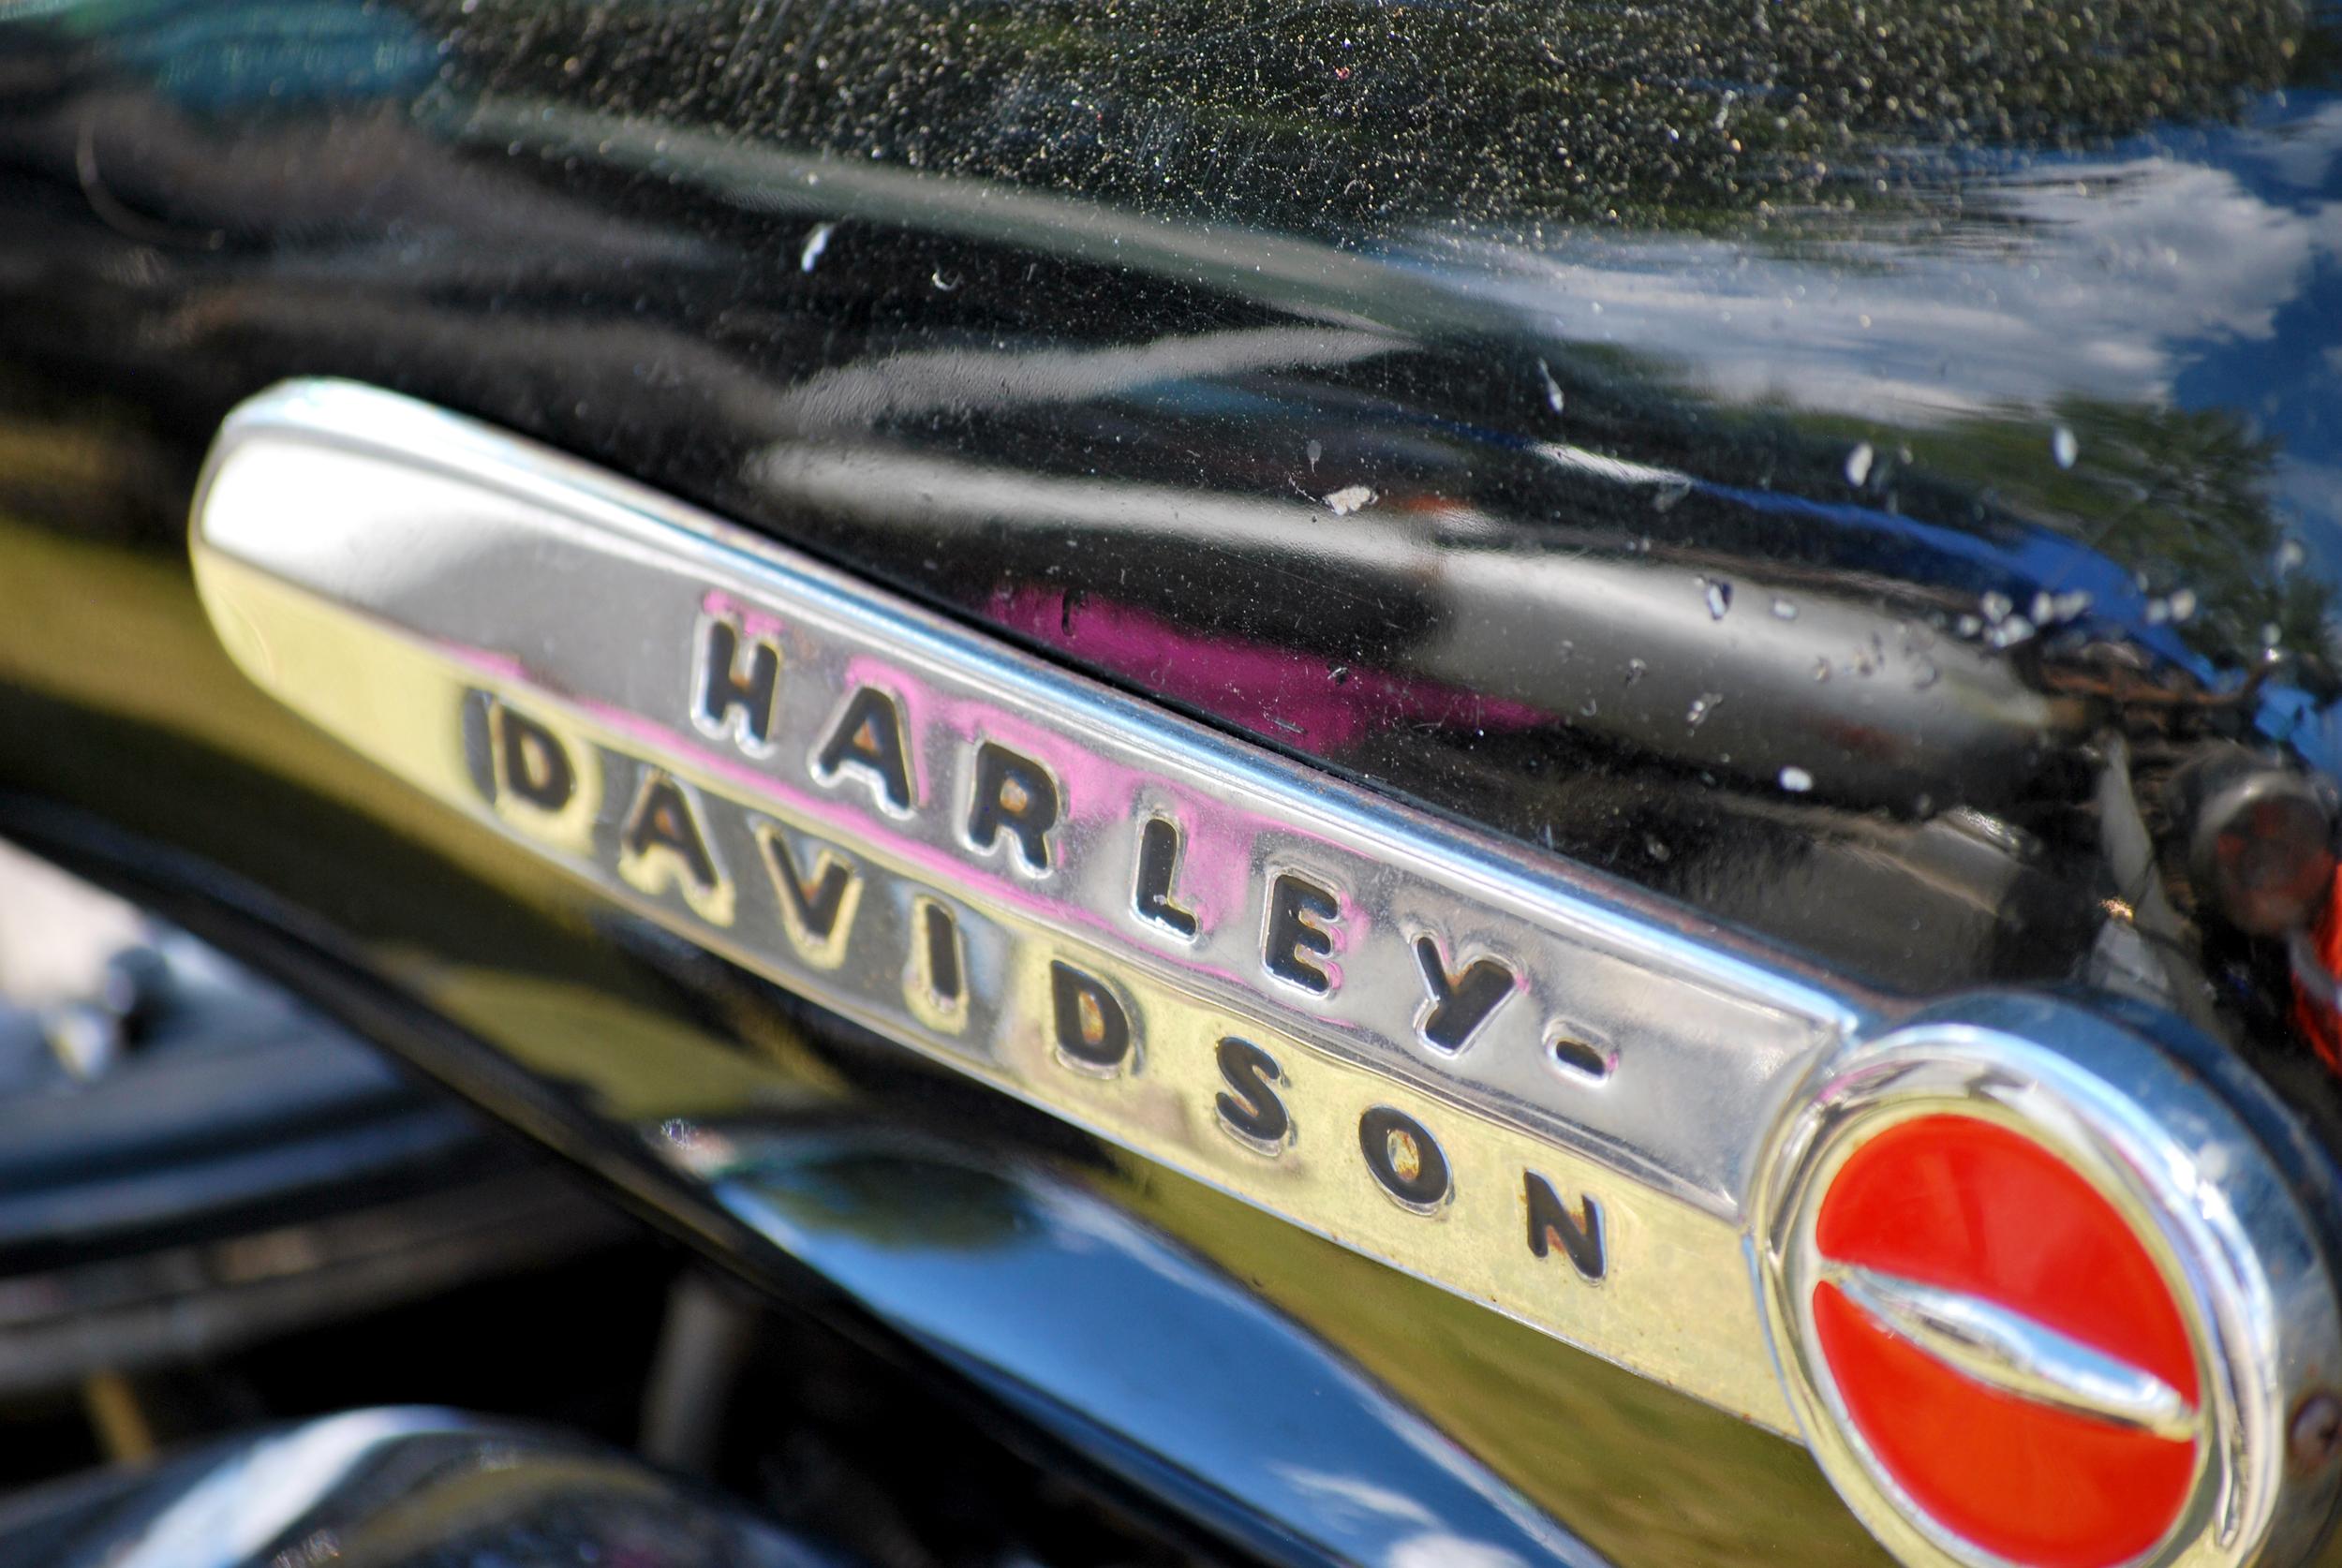 HarleyDavidson_2.JPG